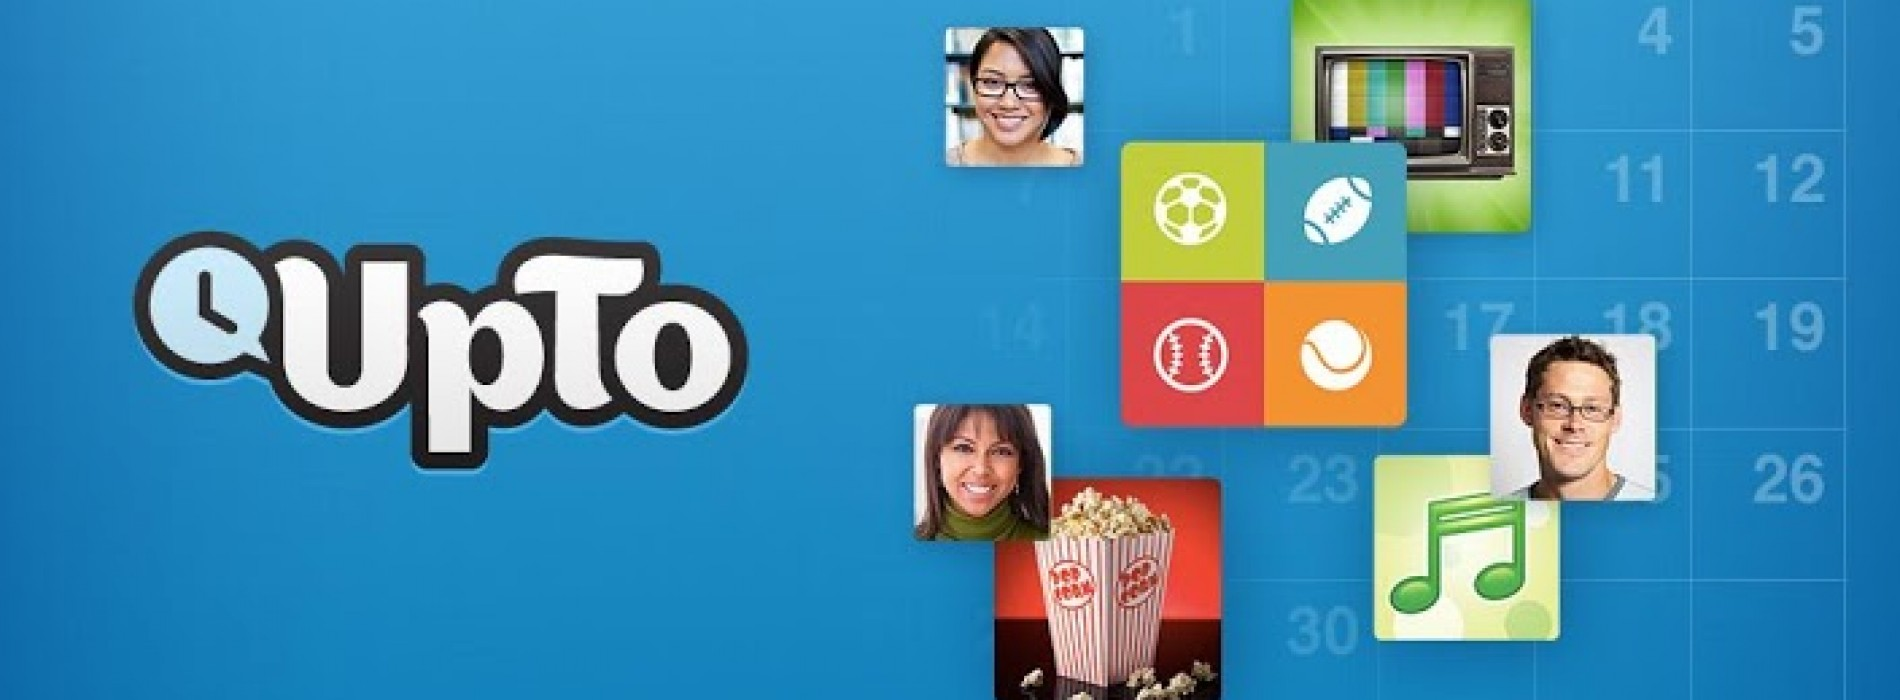 Social calendar app UpTo comes to Android